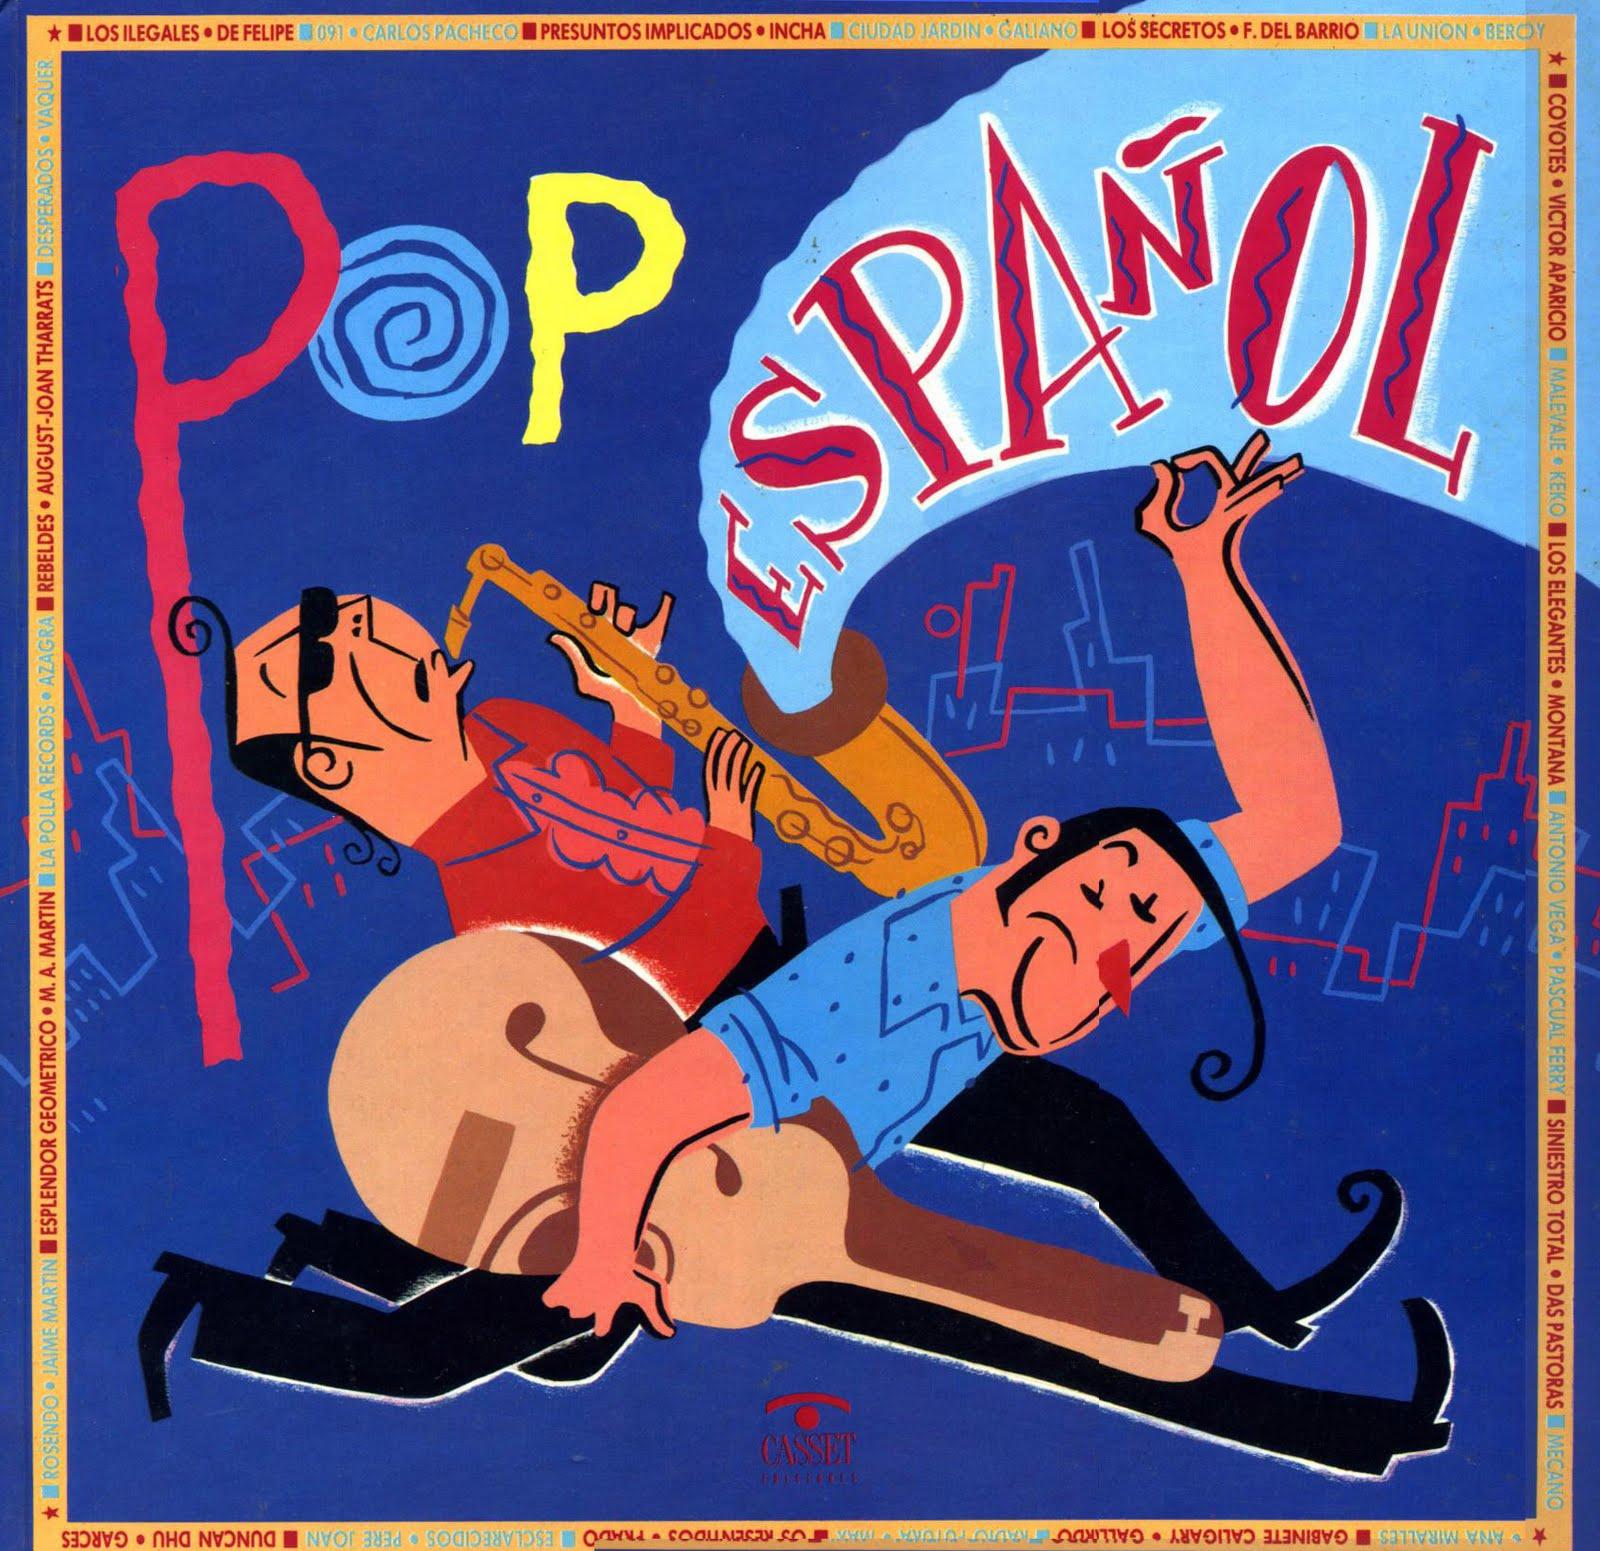 musica en espanol pop: